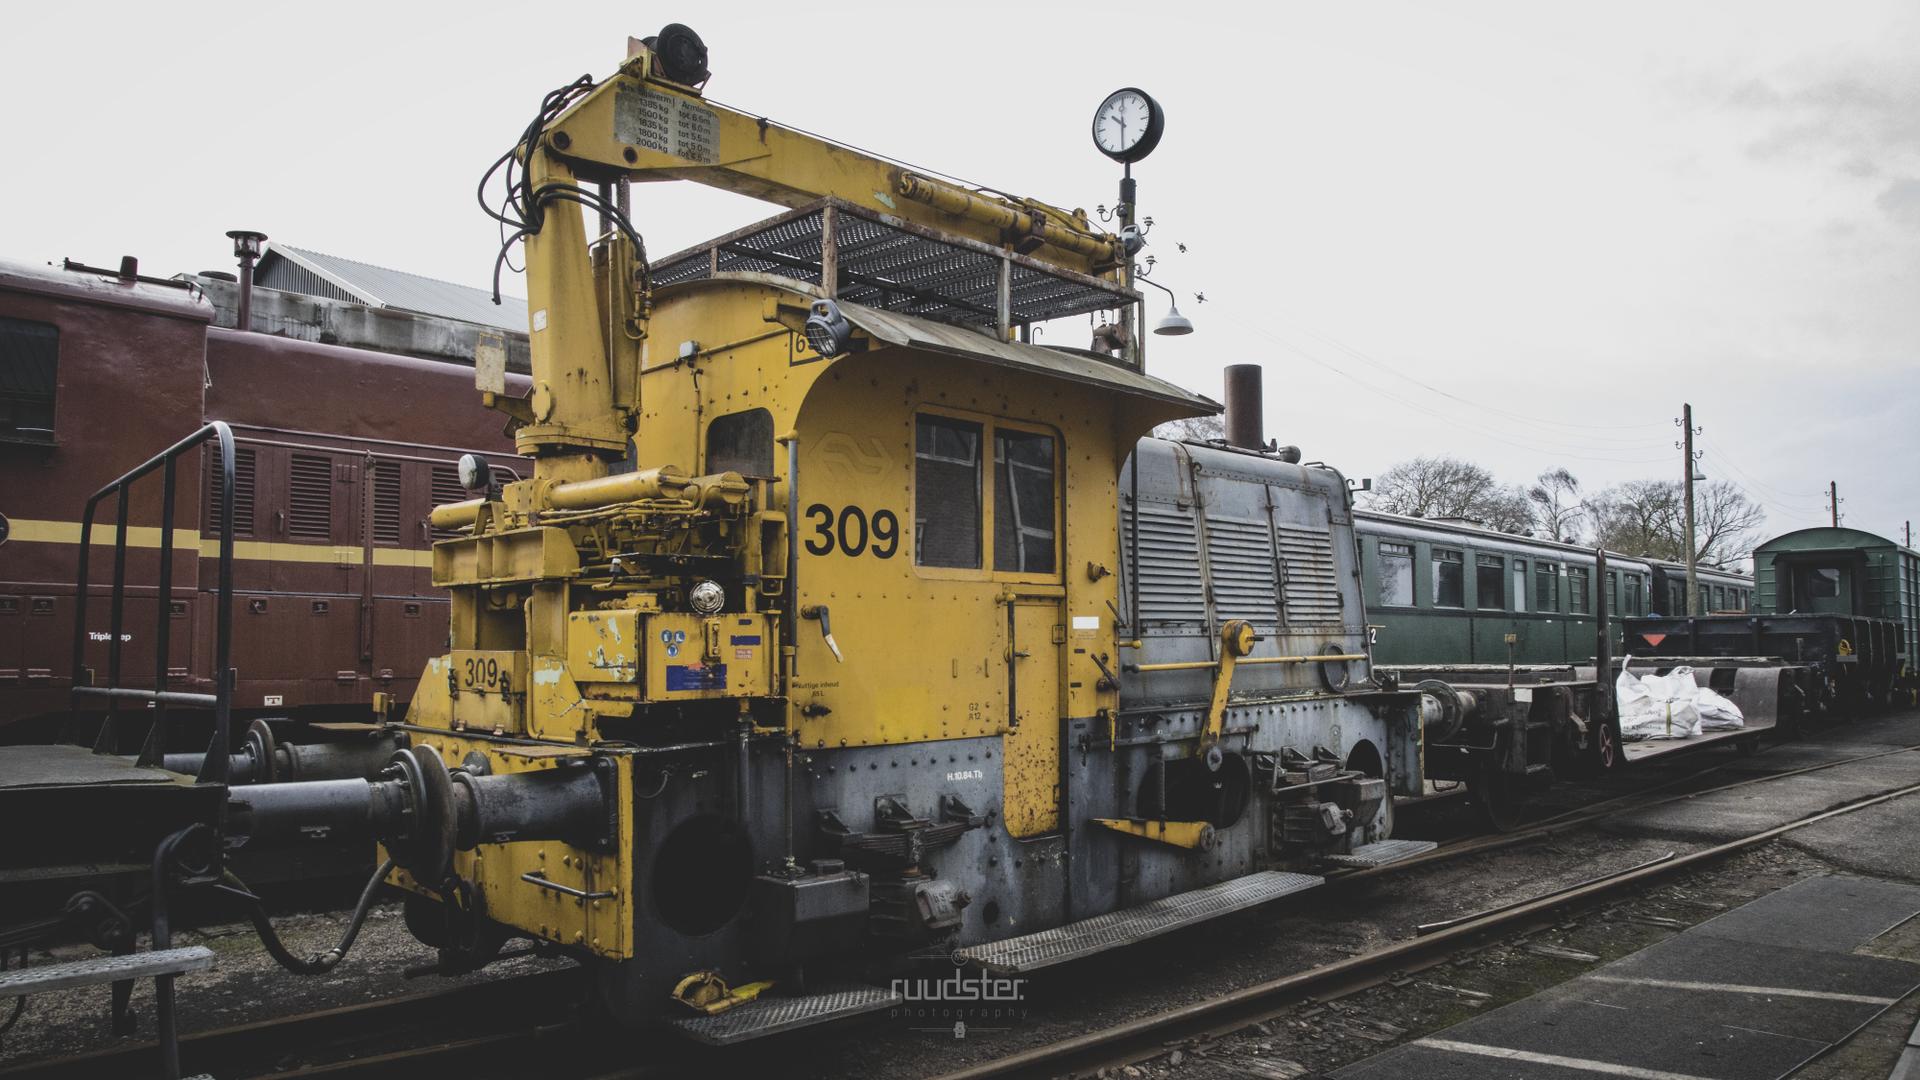 309 | Build: 1940 - Werkspoor, Amsterdam